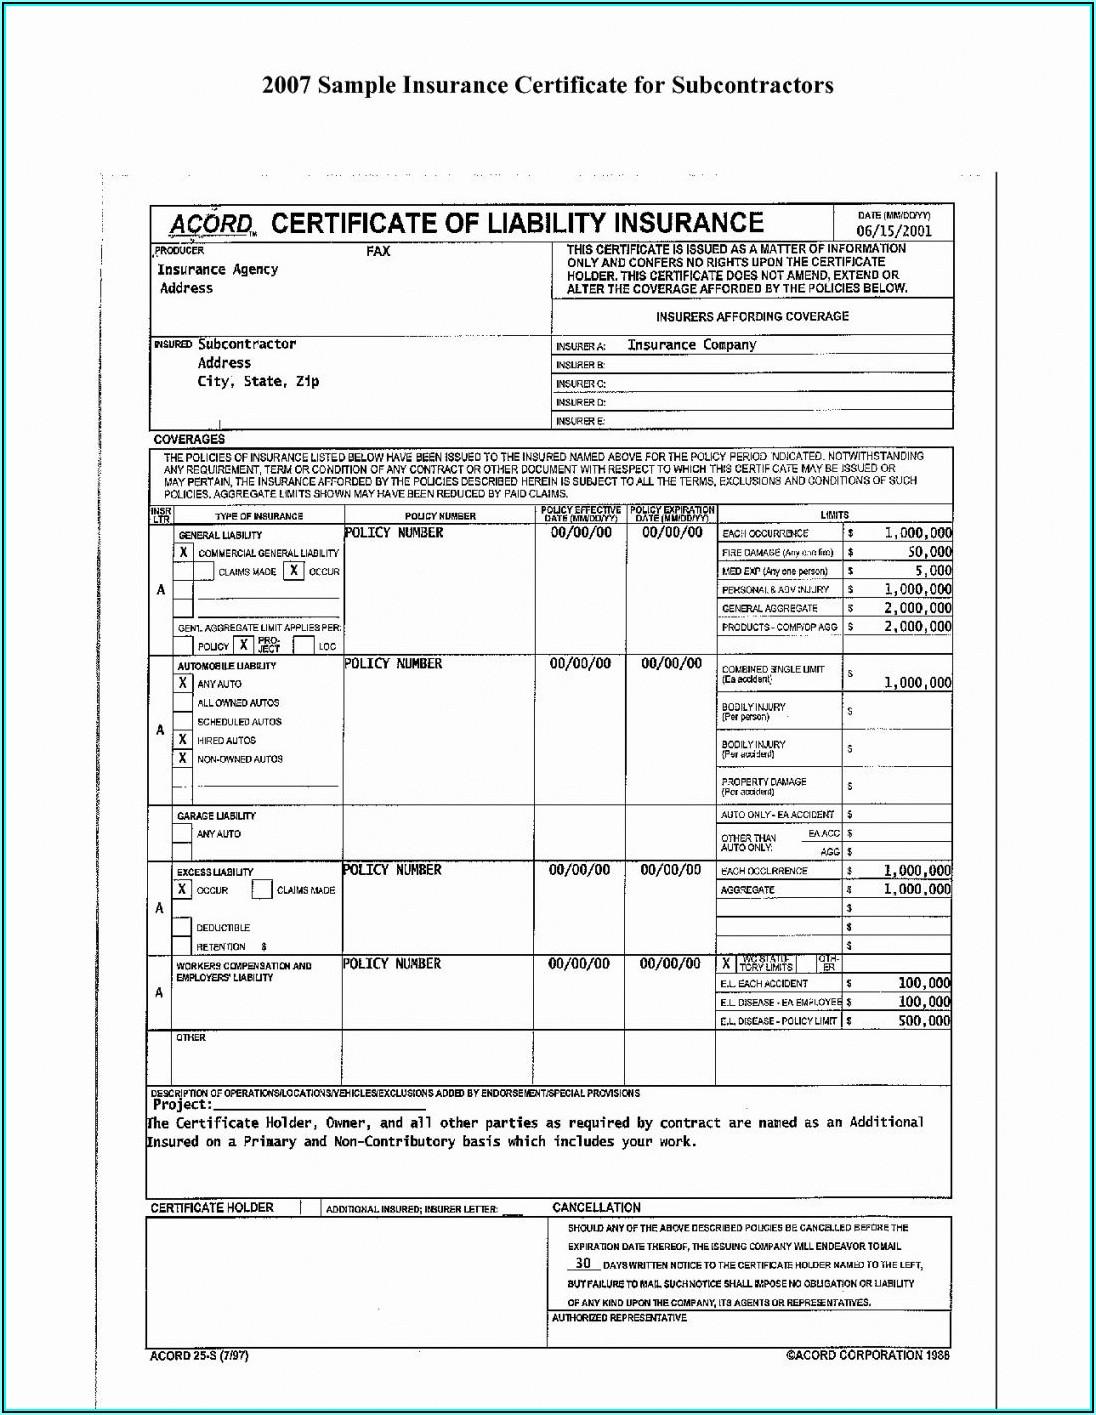 Acord Liability Insurance Form